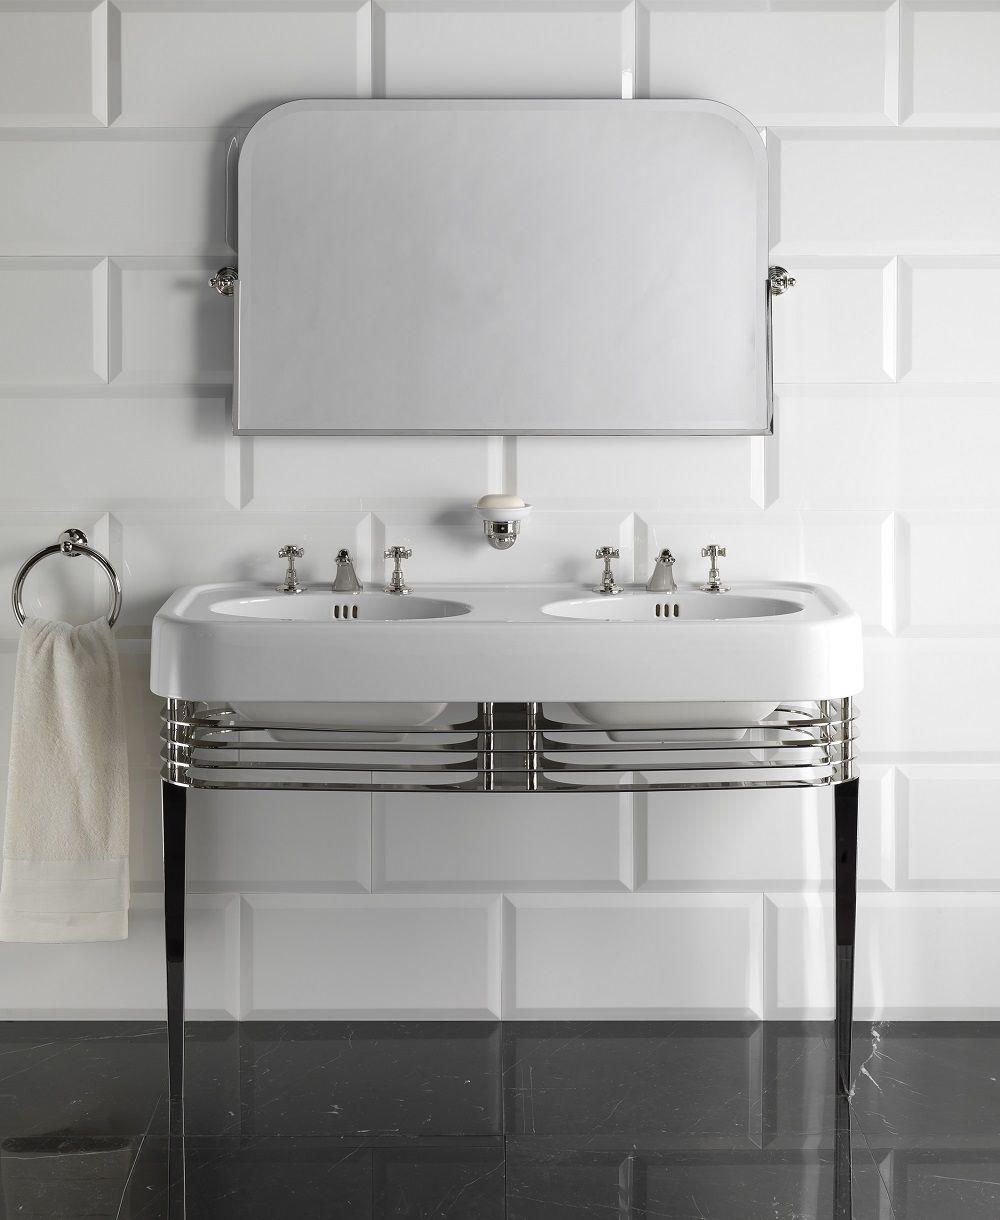 Icff Globaldesign Devon Devon Wide Blues Art Deco Bathroom Modern Art Deco Beautiful Bathrooms